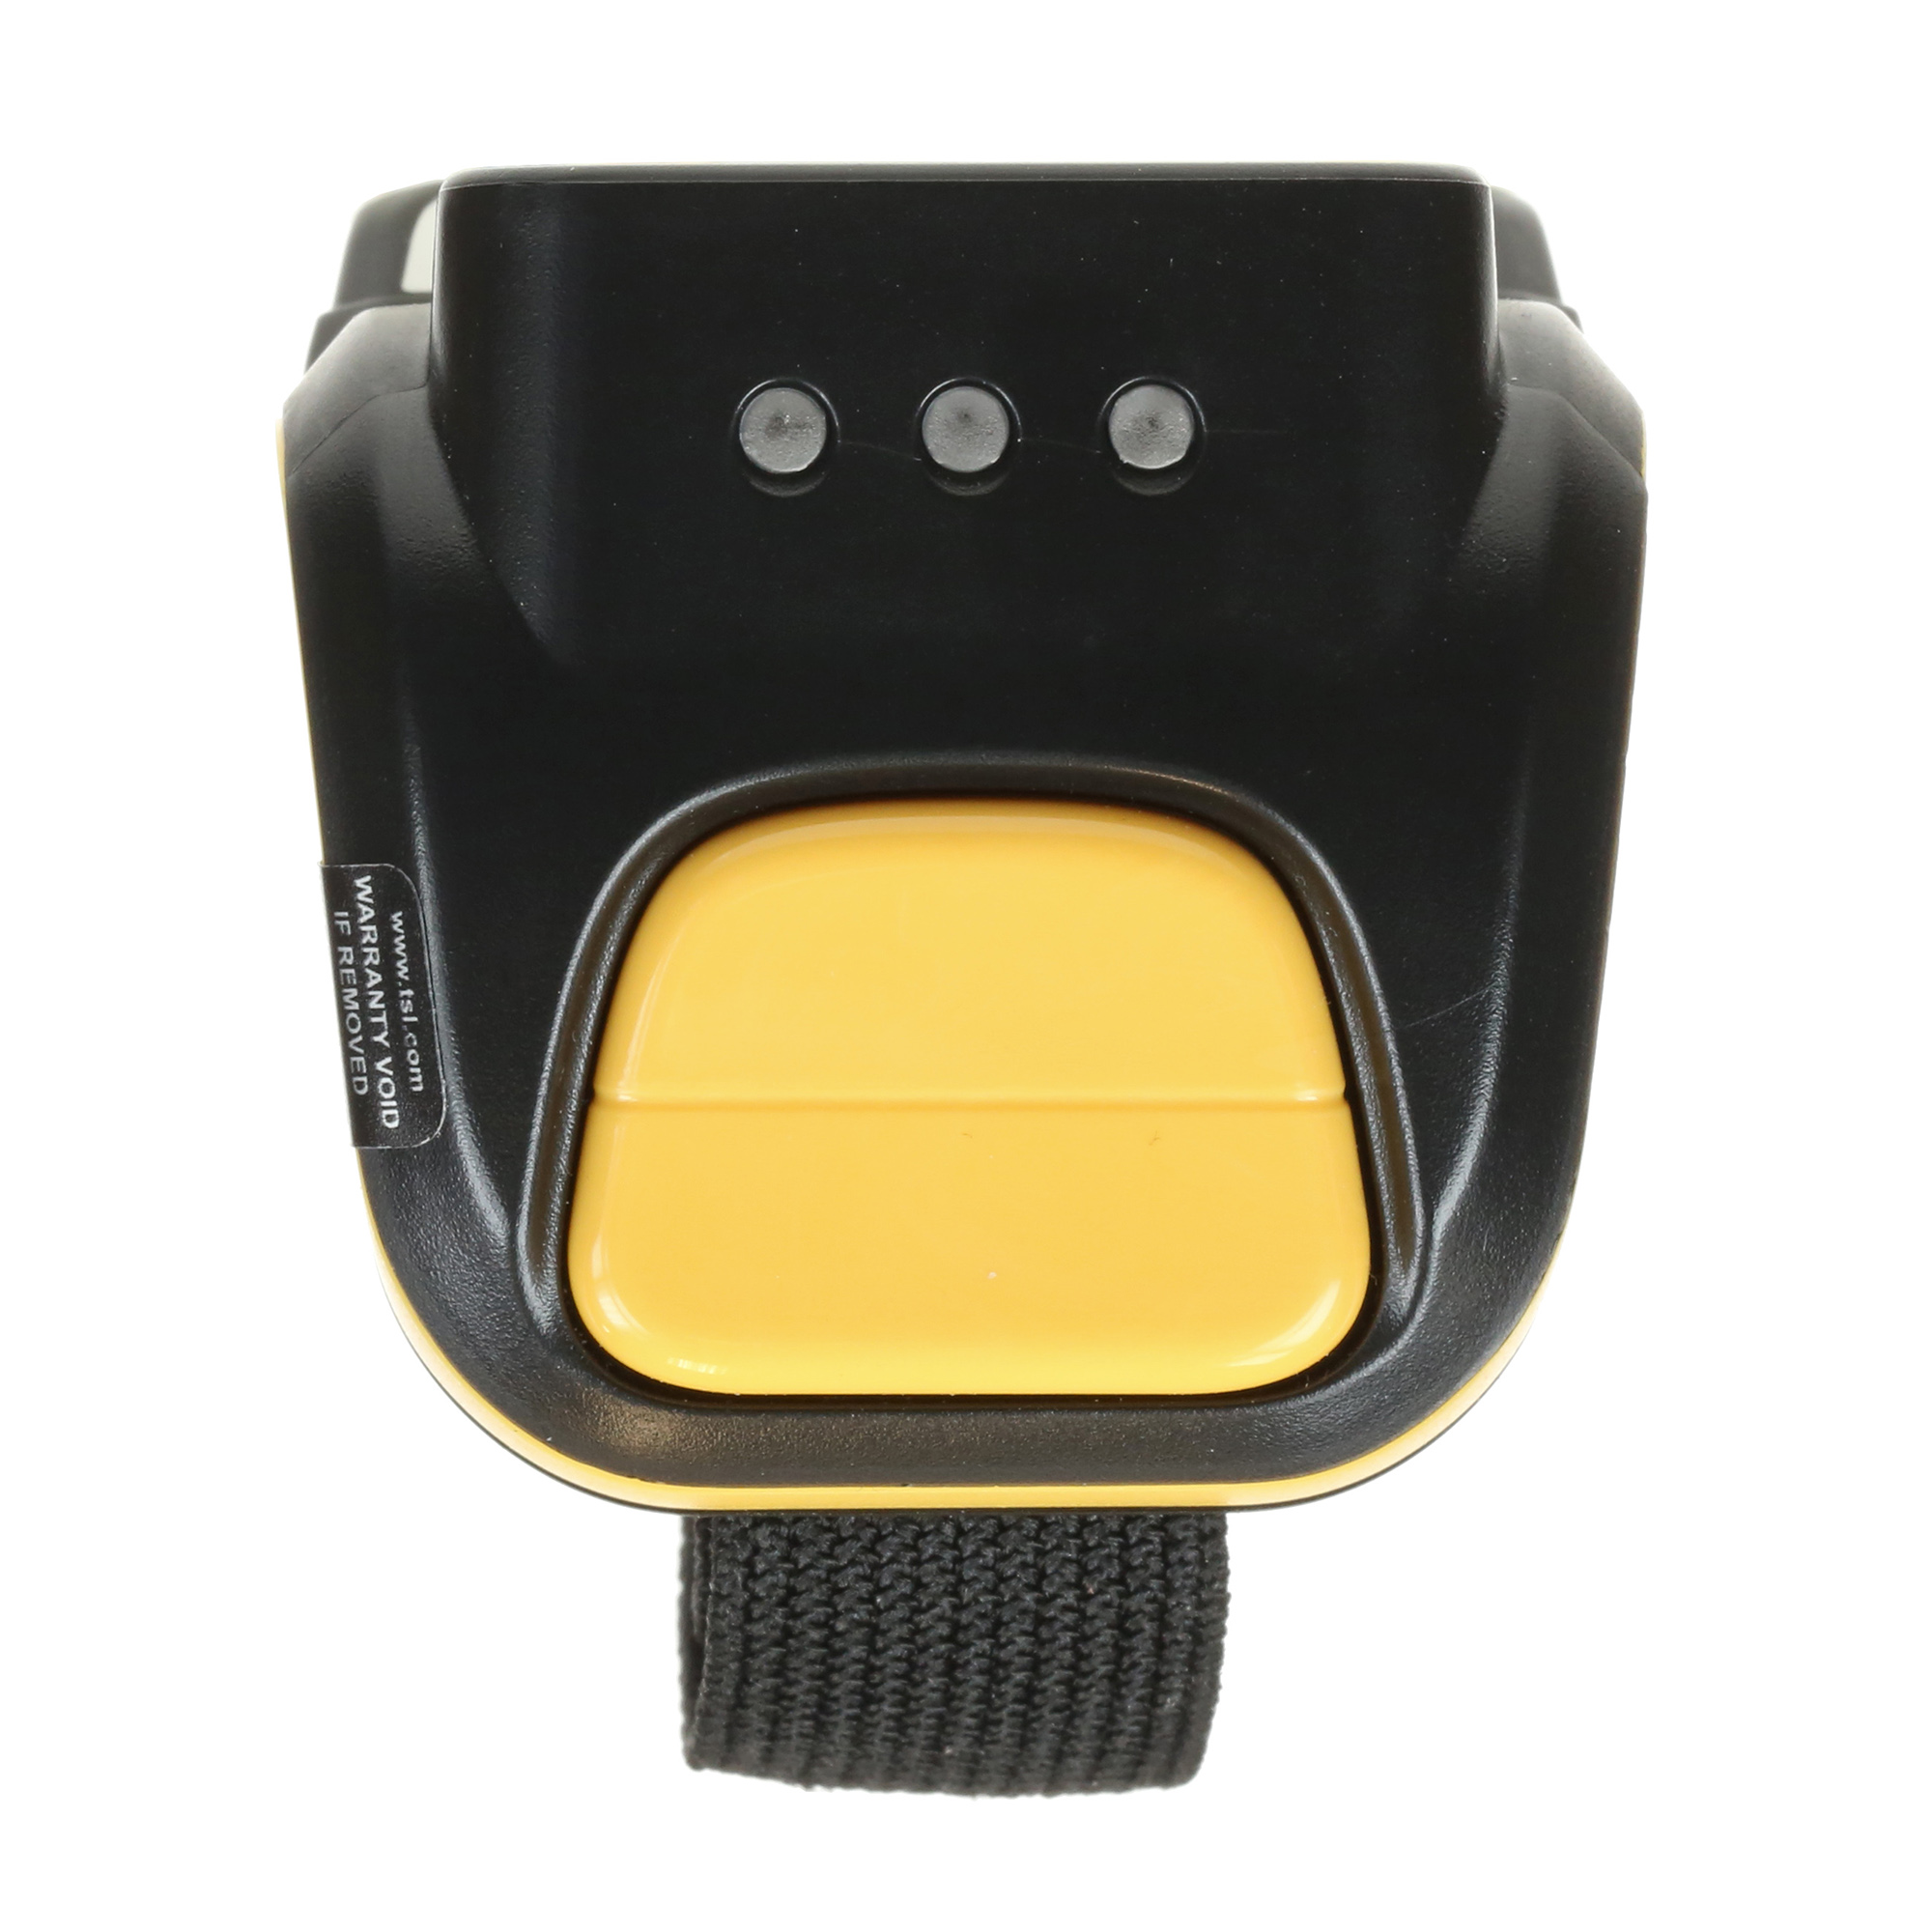 2173 Bluetooth® HF/LF RFID Reader - Technology Solutions (UK